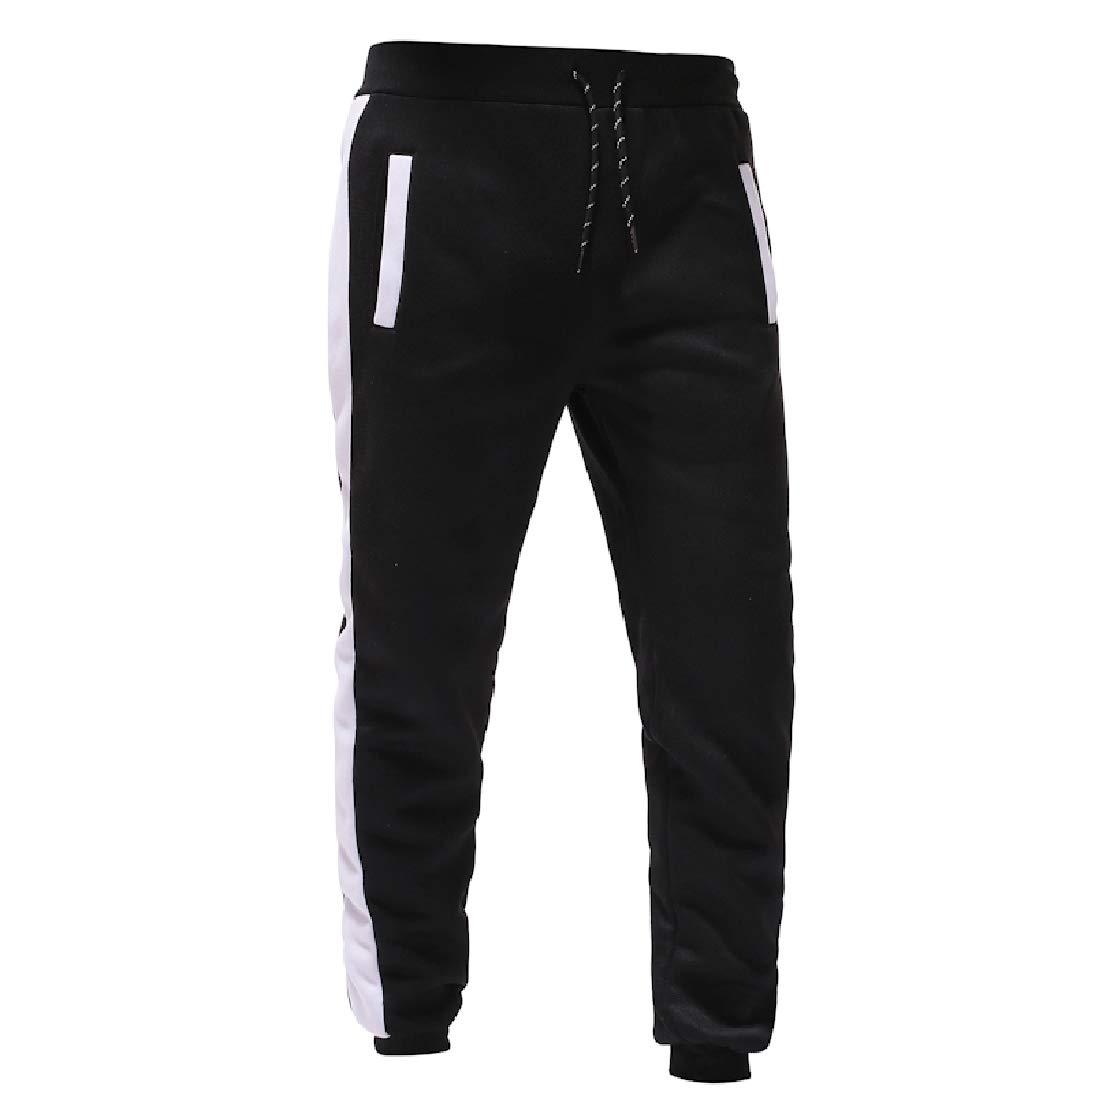 YUNY Mens Cozy Pockets Drawstring Loose Splicing Sport Pants White S